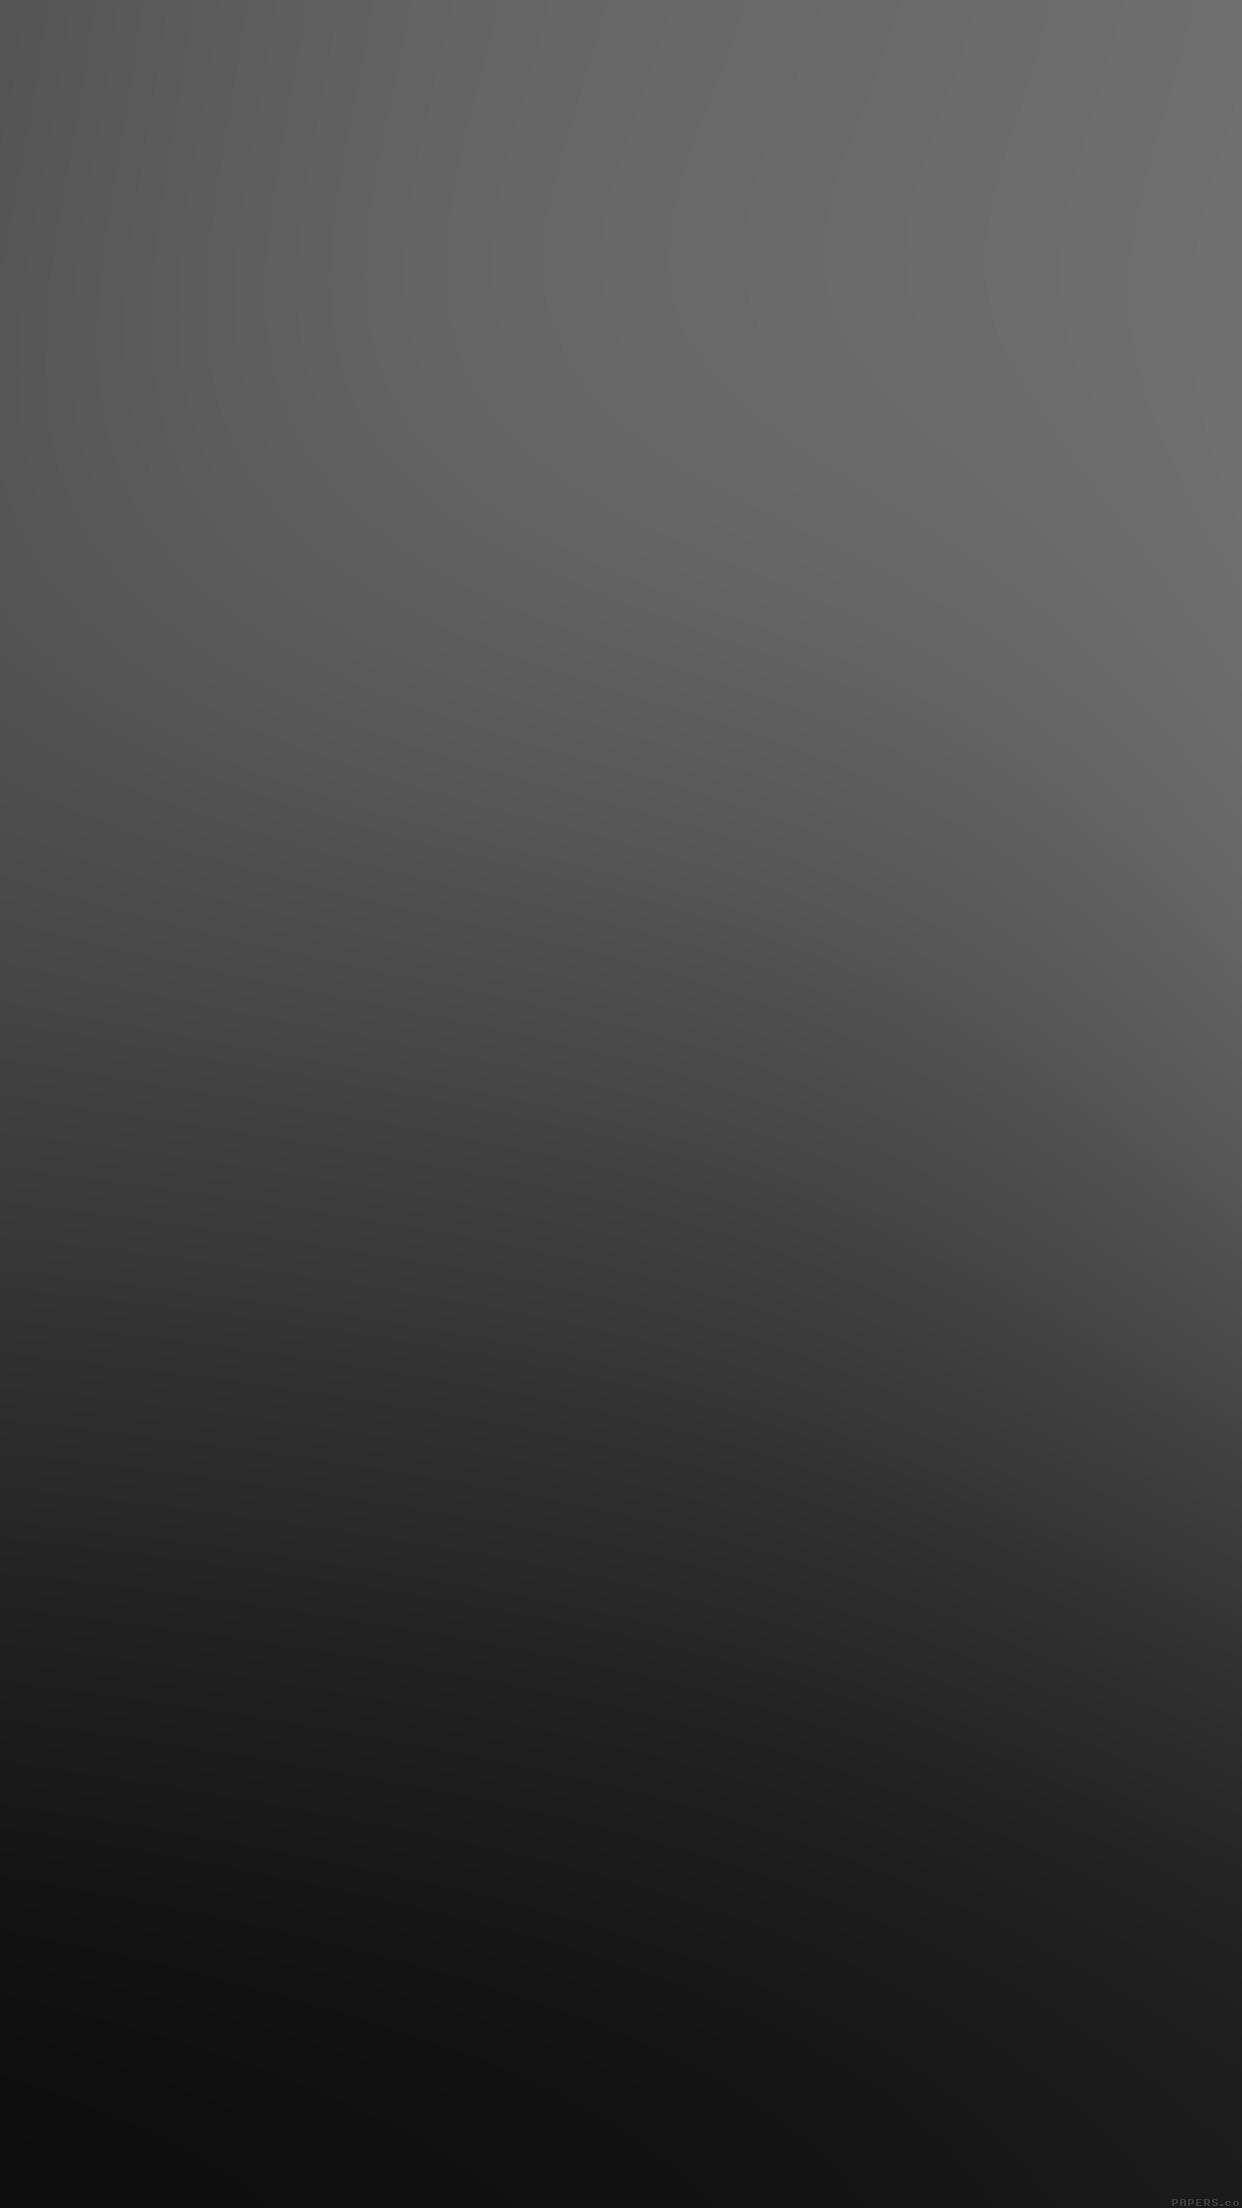 march-apple-event-dark-black-pattern-34-iphone-